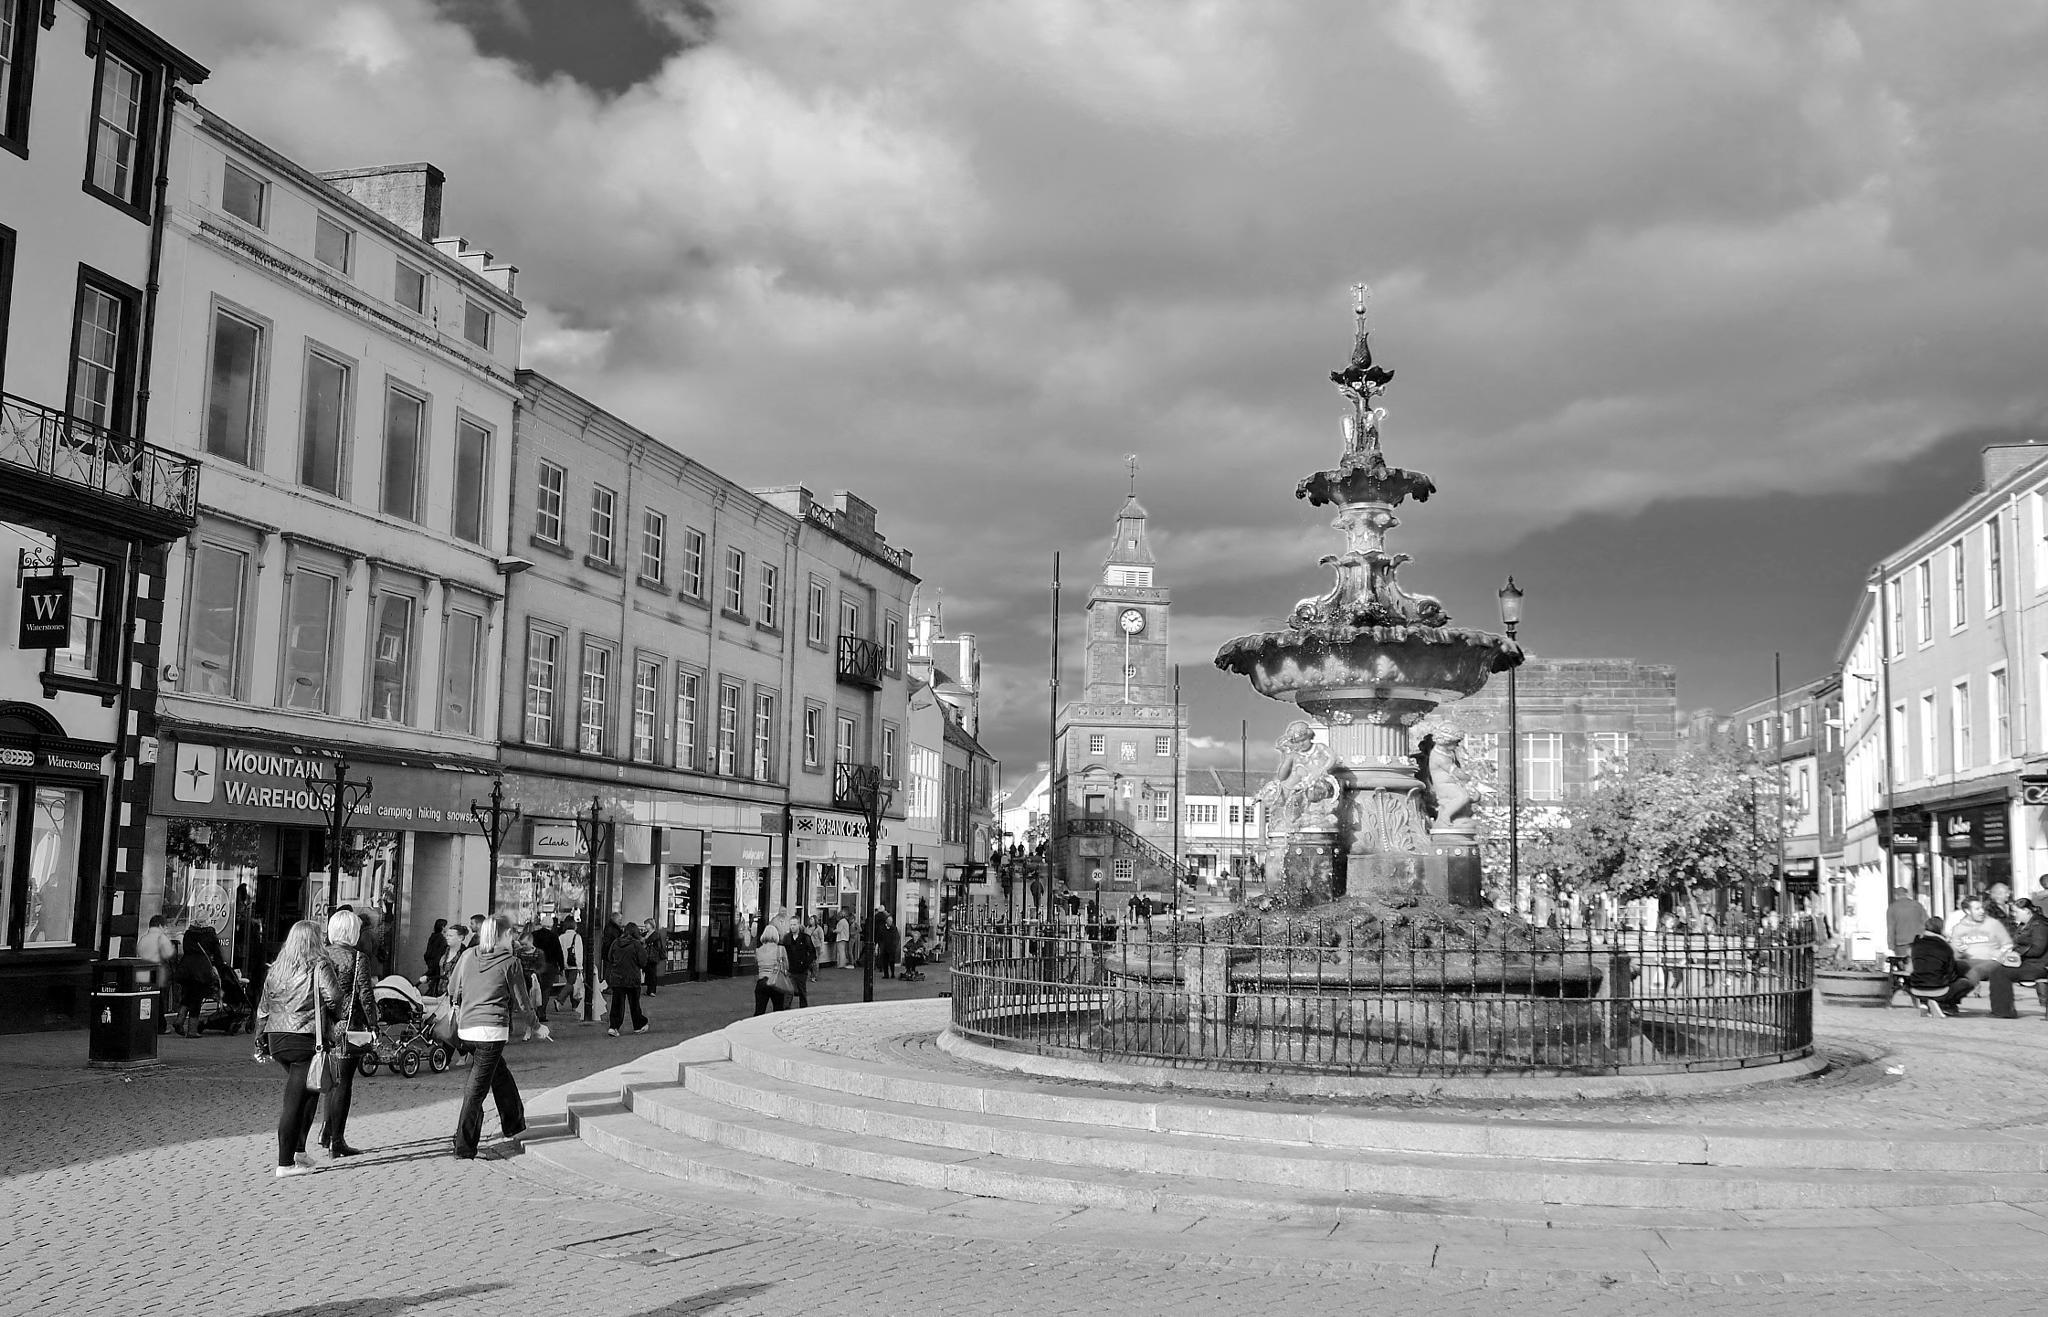 Dumfries town centre, Scotland by georgeporteous